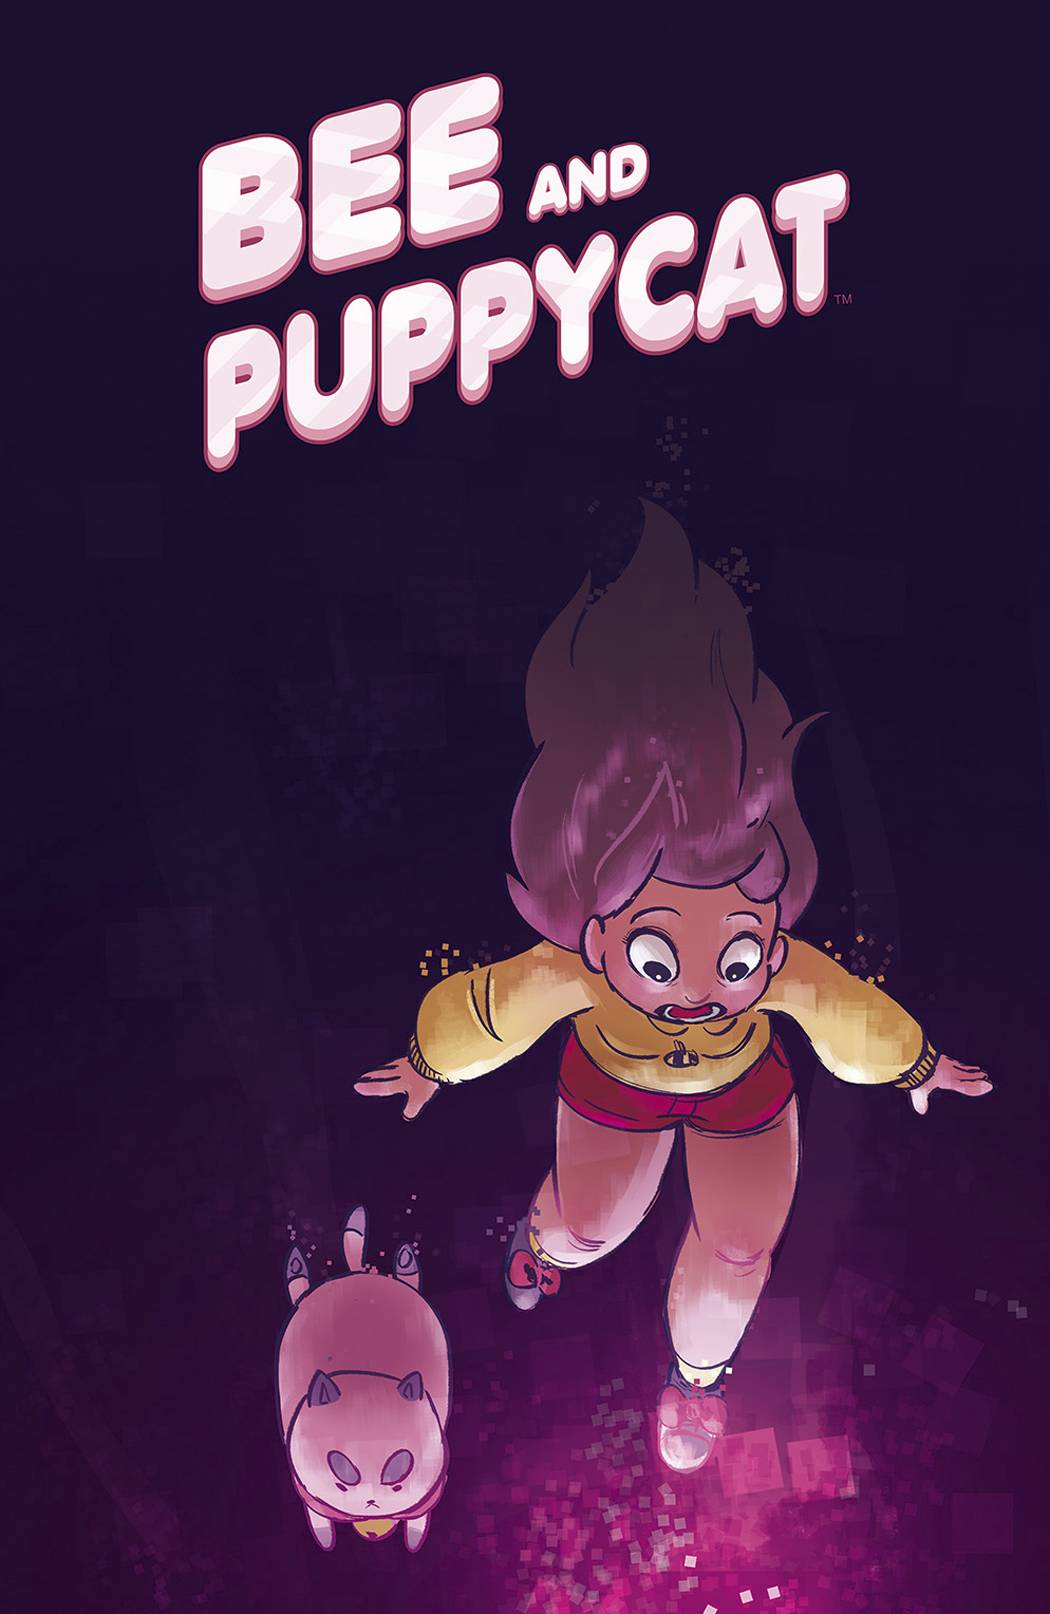 Bee Puppycat 6 By Natasha Allegri Published Boom Studios ForbiddenPlanet